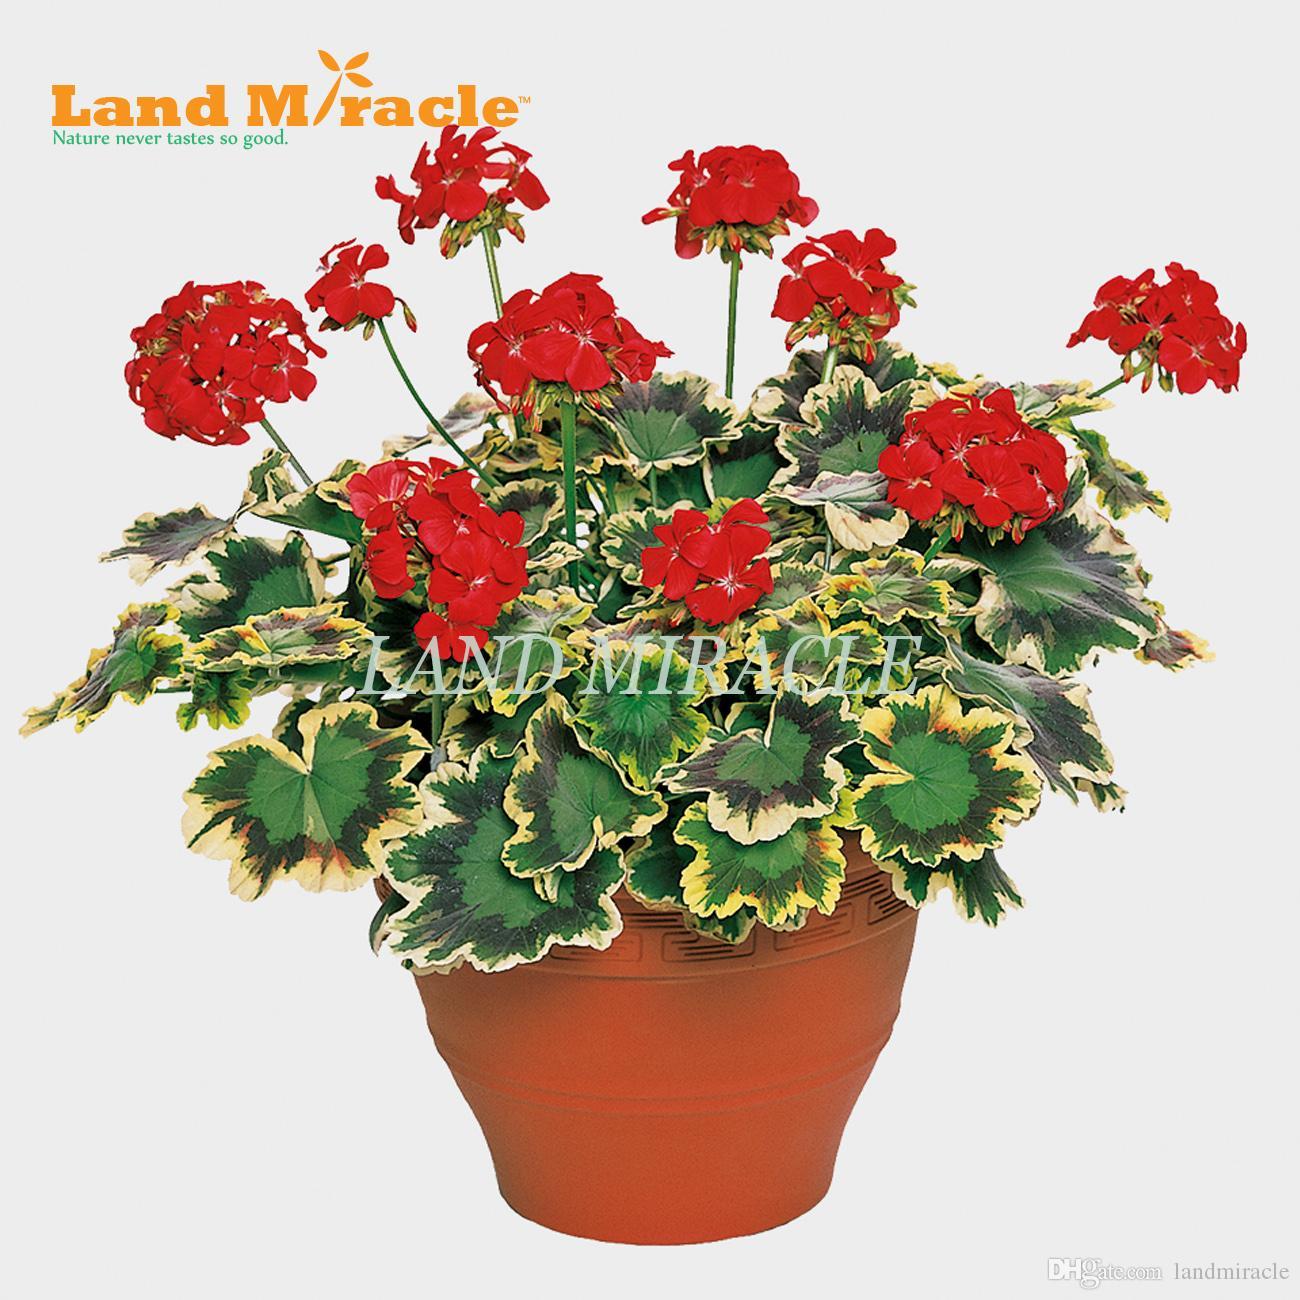 Rare Geranium Seeds, 5 Seeds, Red Pelargonium Perennial Garden Flowers Bonsai Potted Plant indoor / outdoor